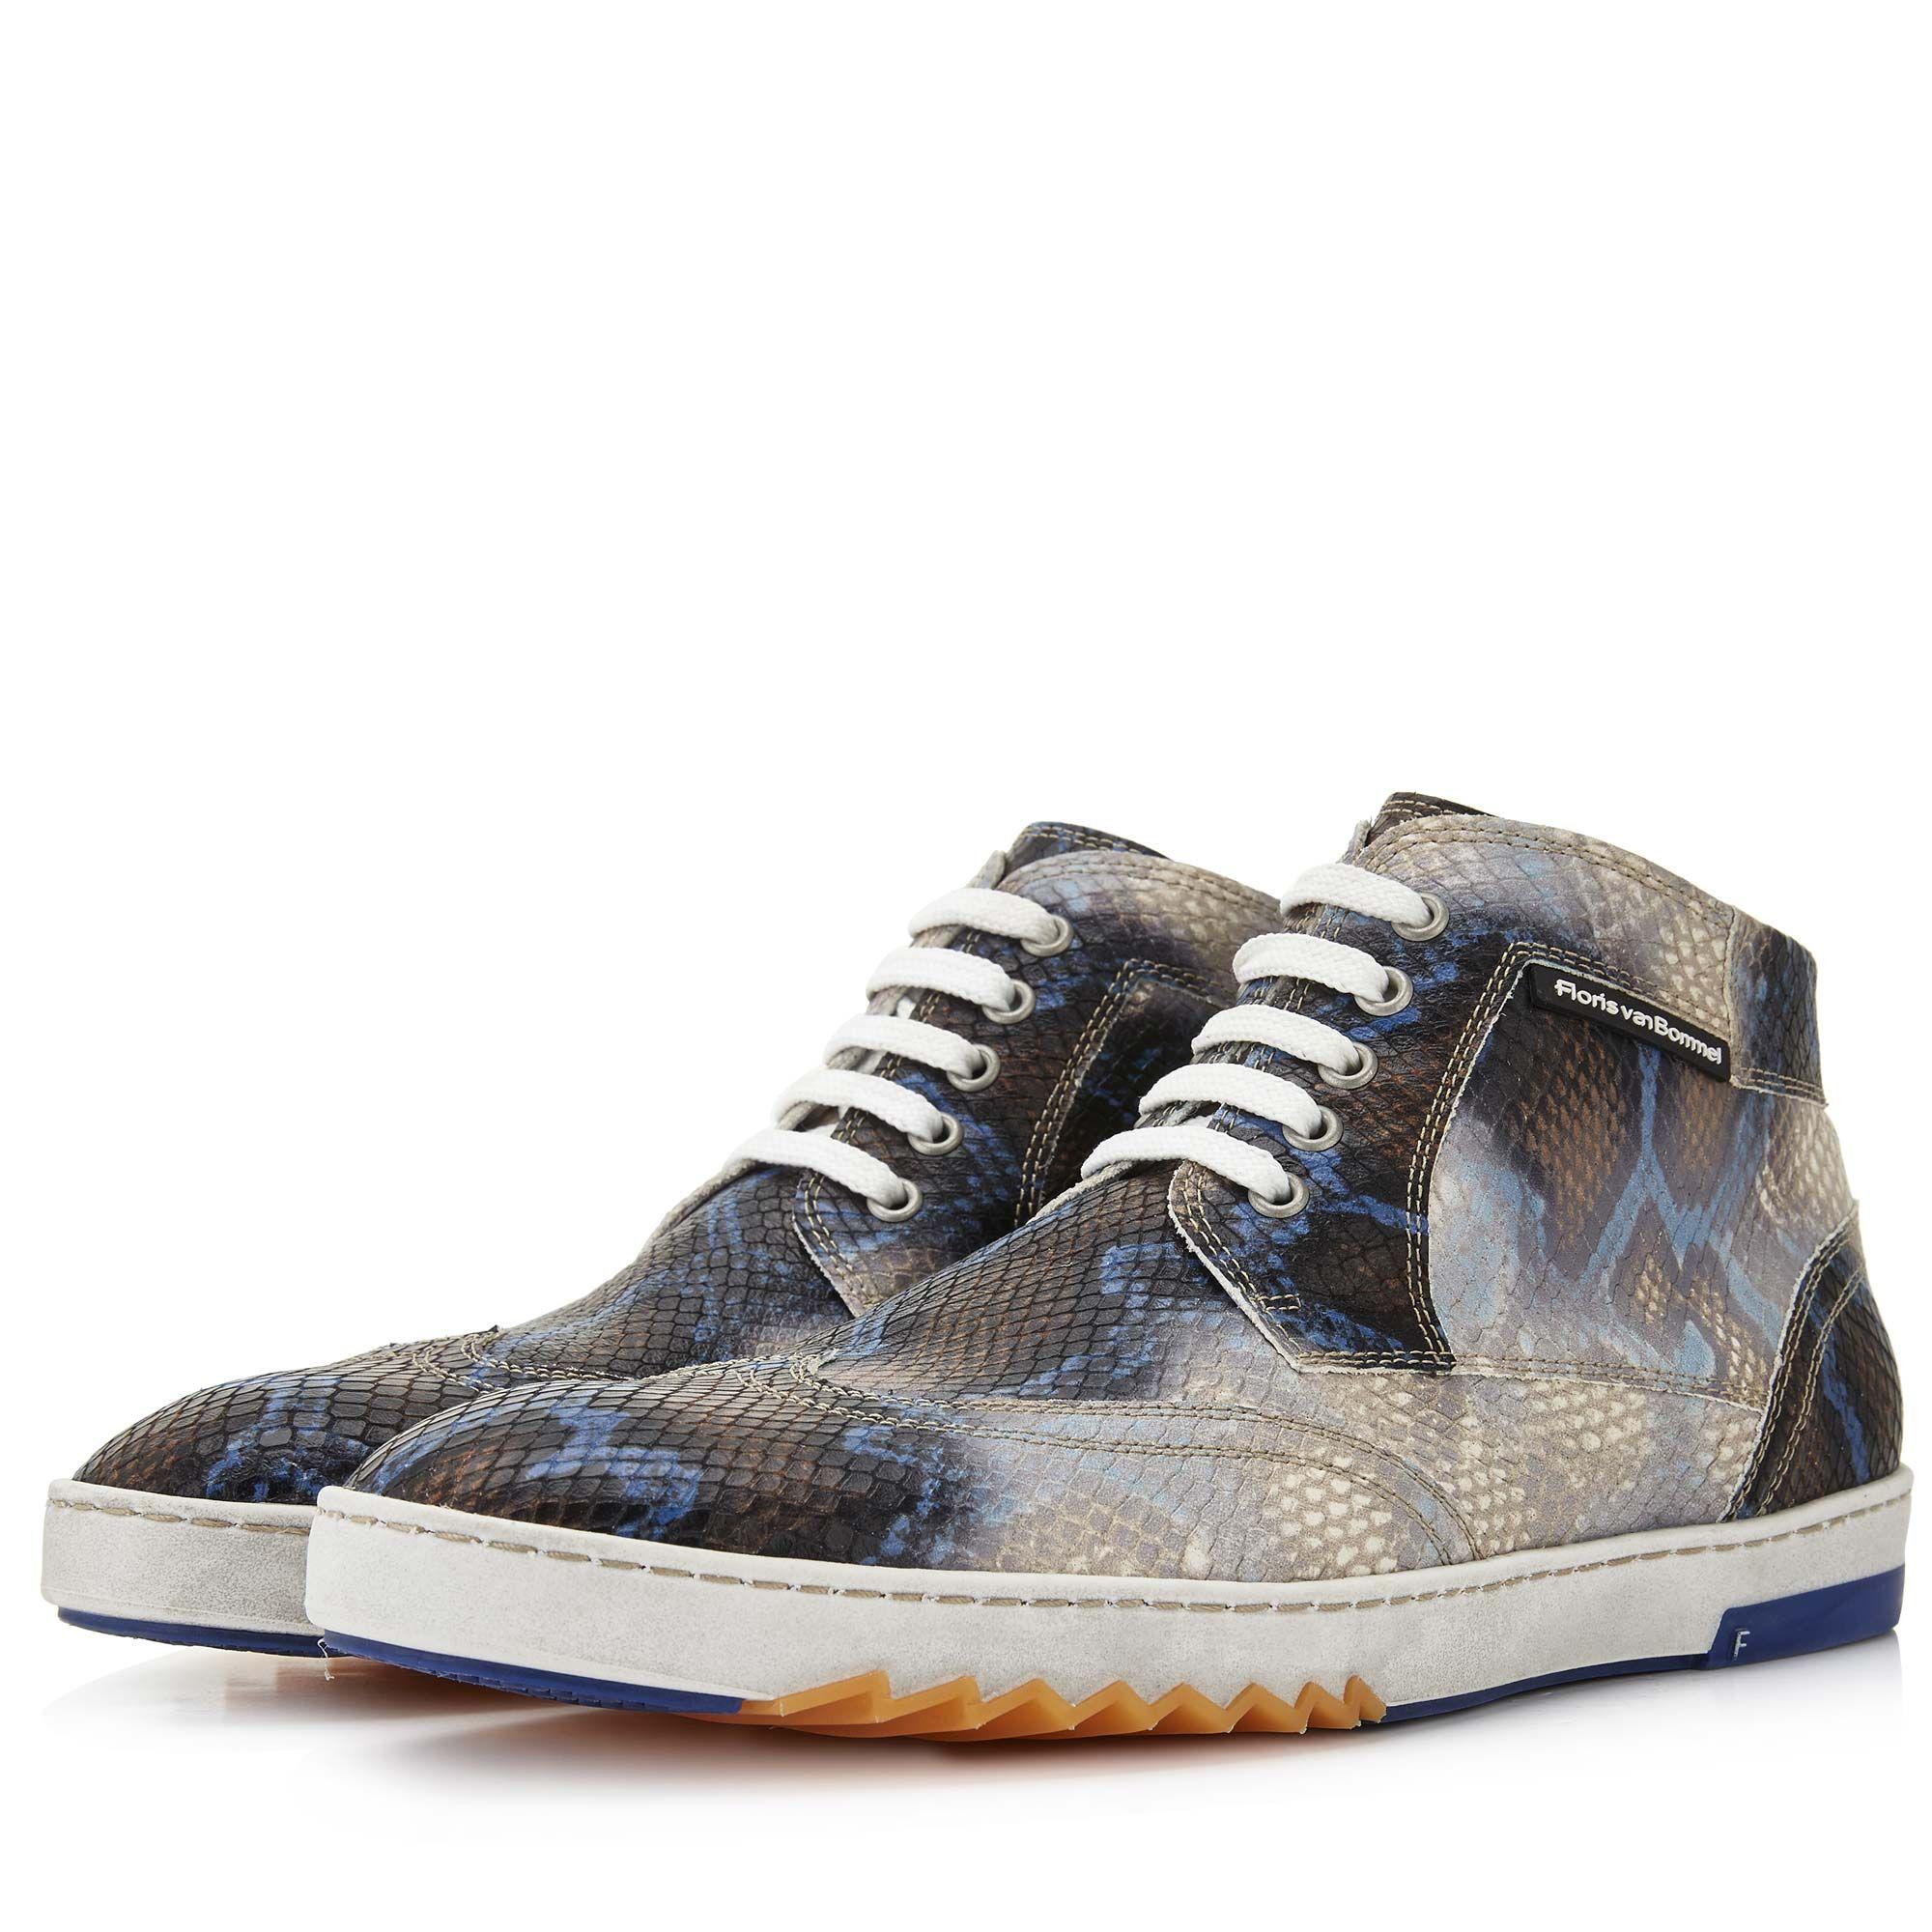 Floris Van Bommel Sneaker Sombre Imprimé Serpent. DO2KoCvC4f